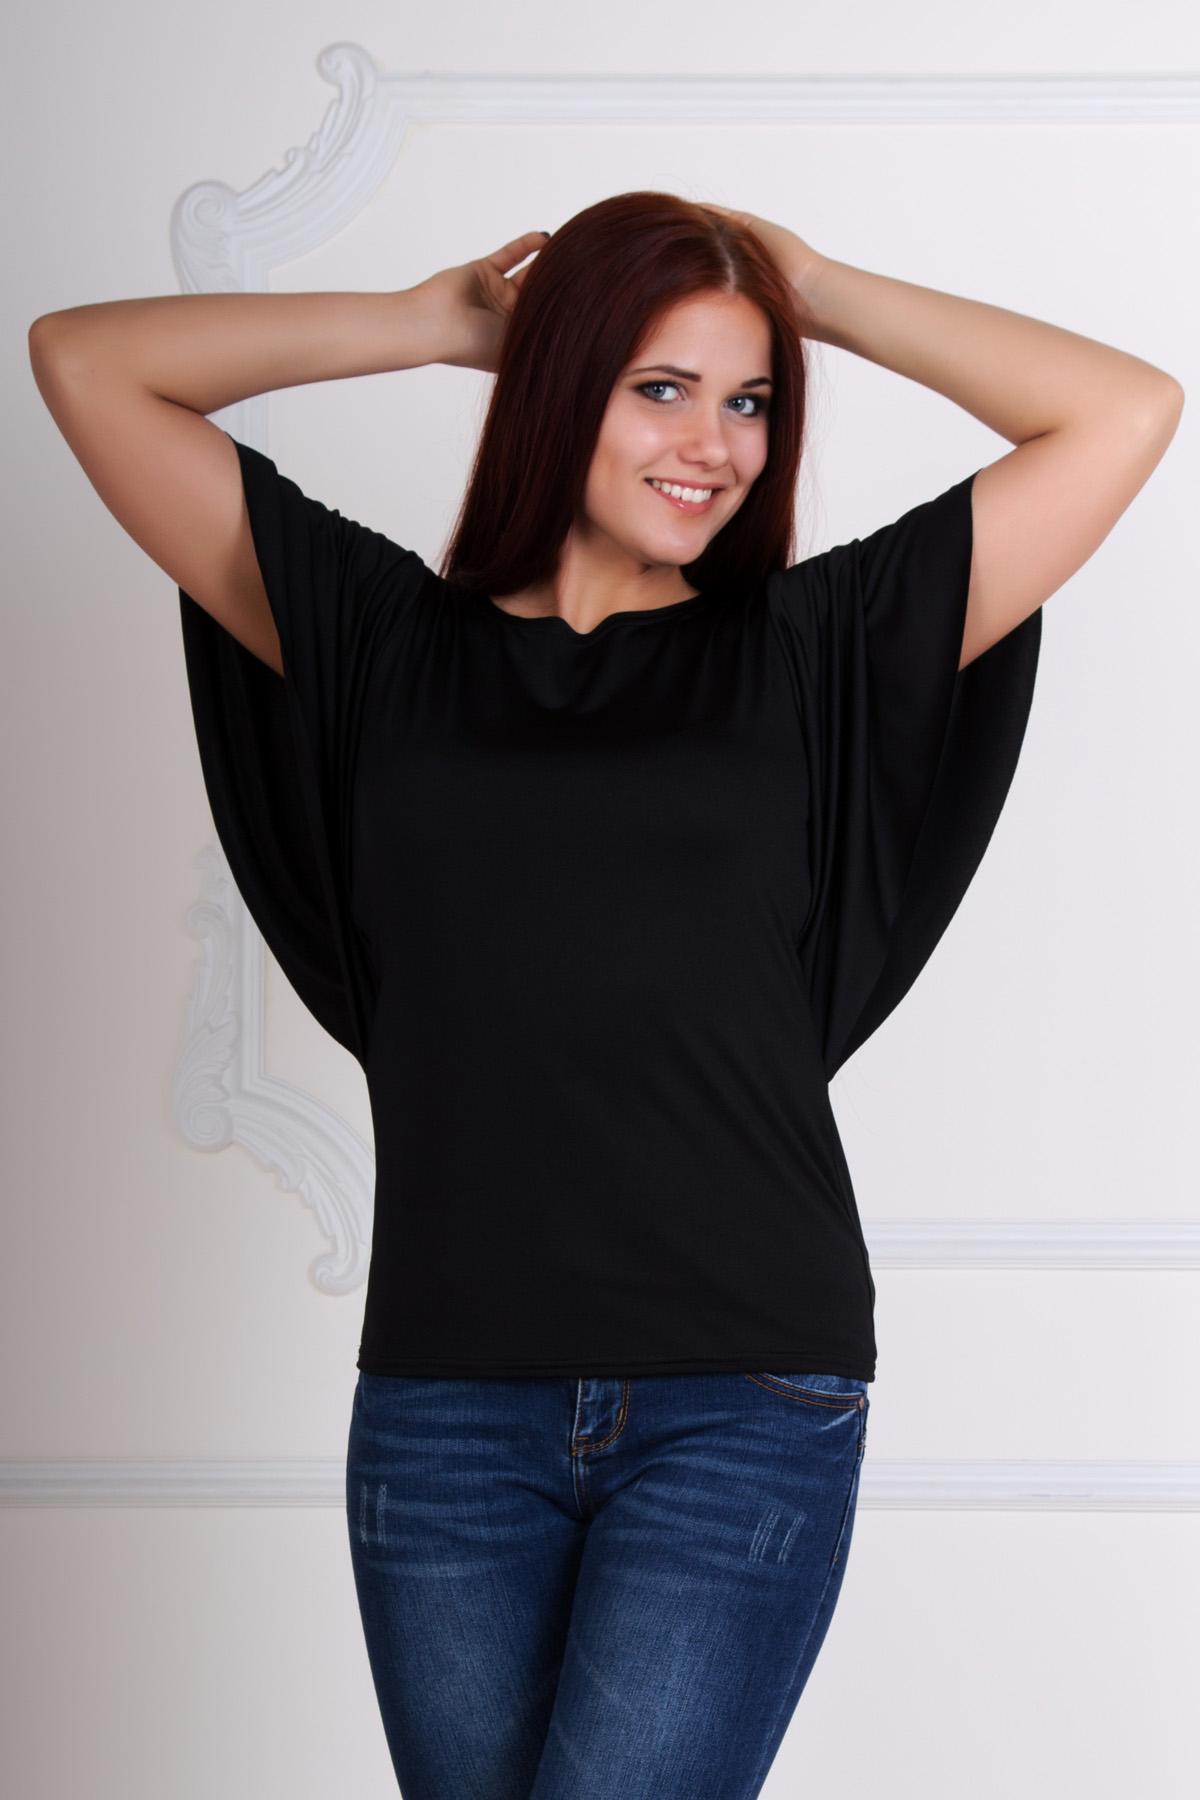 Жен. блуза Кармен р. 48Блузы<br>Обхват груди:96 см<br>Обхват талии:78 см<br>Обхват бедер:104 см<br>Длина по спинке:60 см<br>Рост:167 см<br><br>Тип: Жен. блуза<br>Размер: 48<br>Материал: Масло